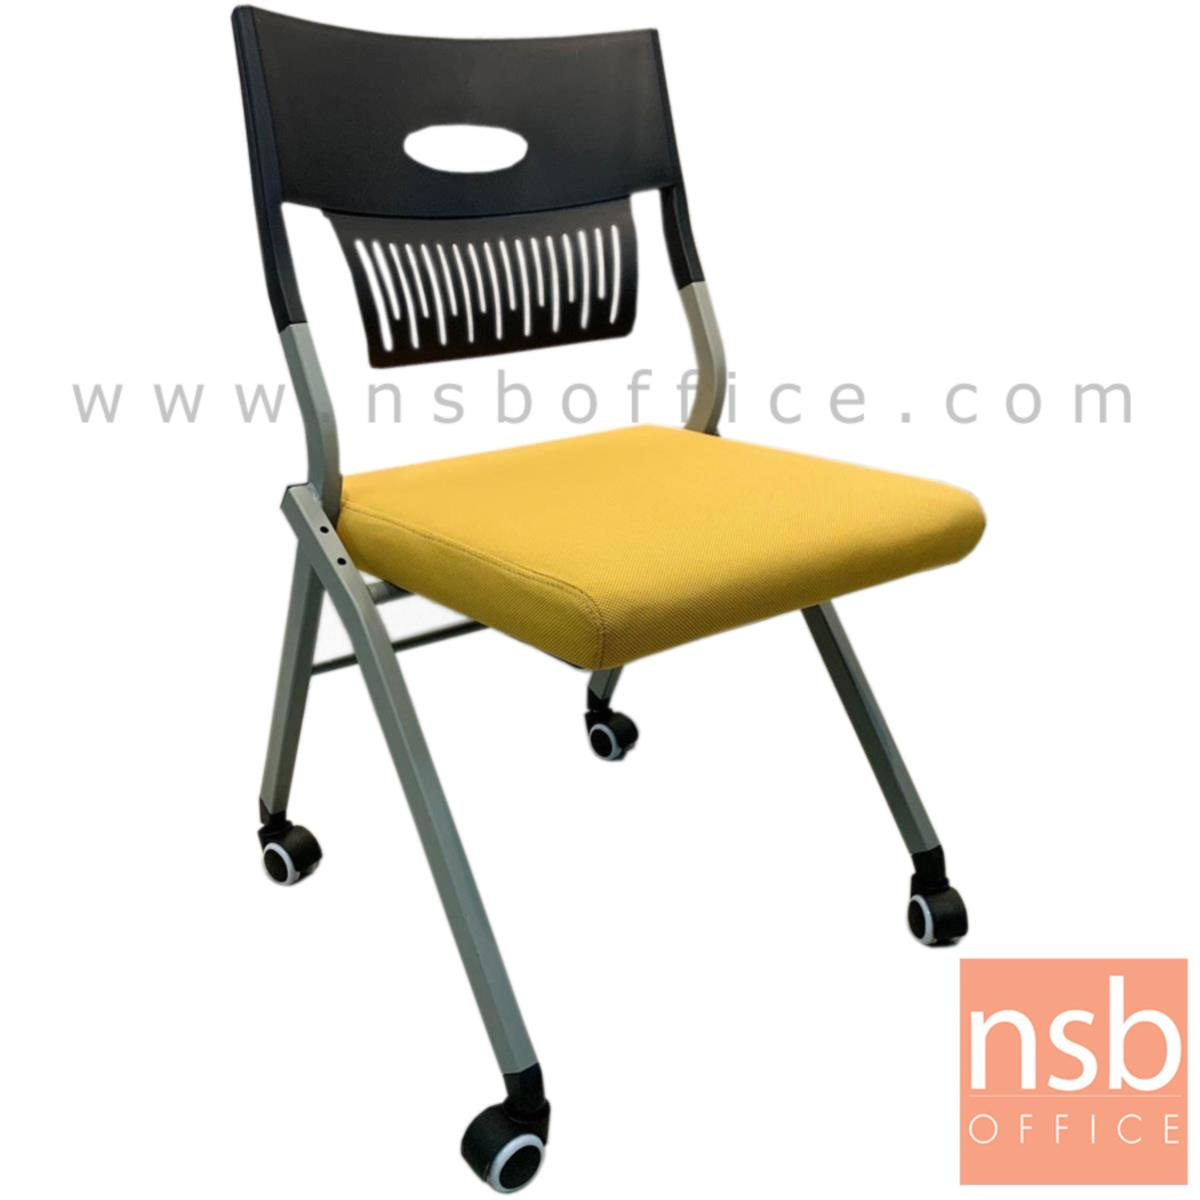 B05A169:เก้าอี้สำนักงานโพลี่ล้อเลื่อน รุ่น Milton (มิลตัน)  ขาเหล็กพ่นสี